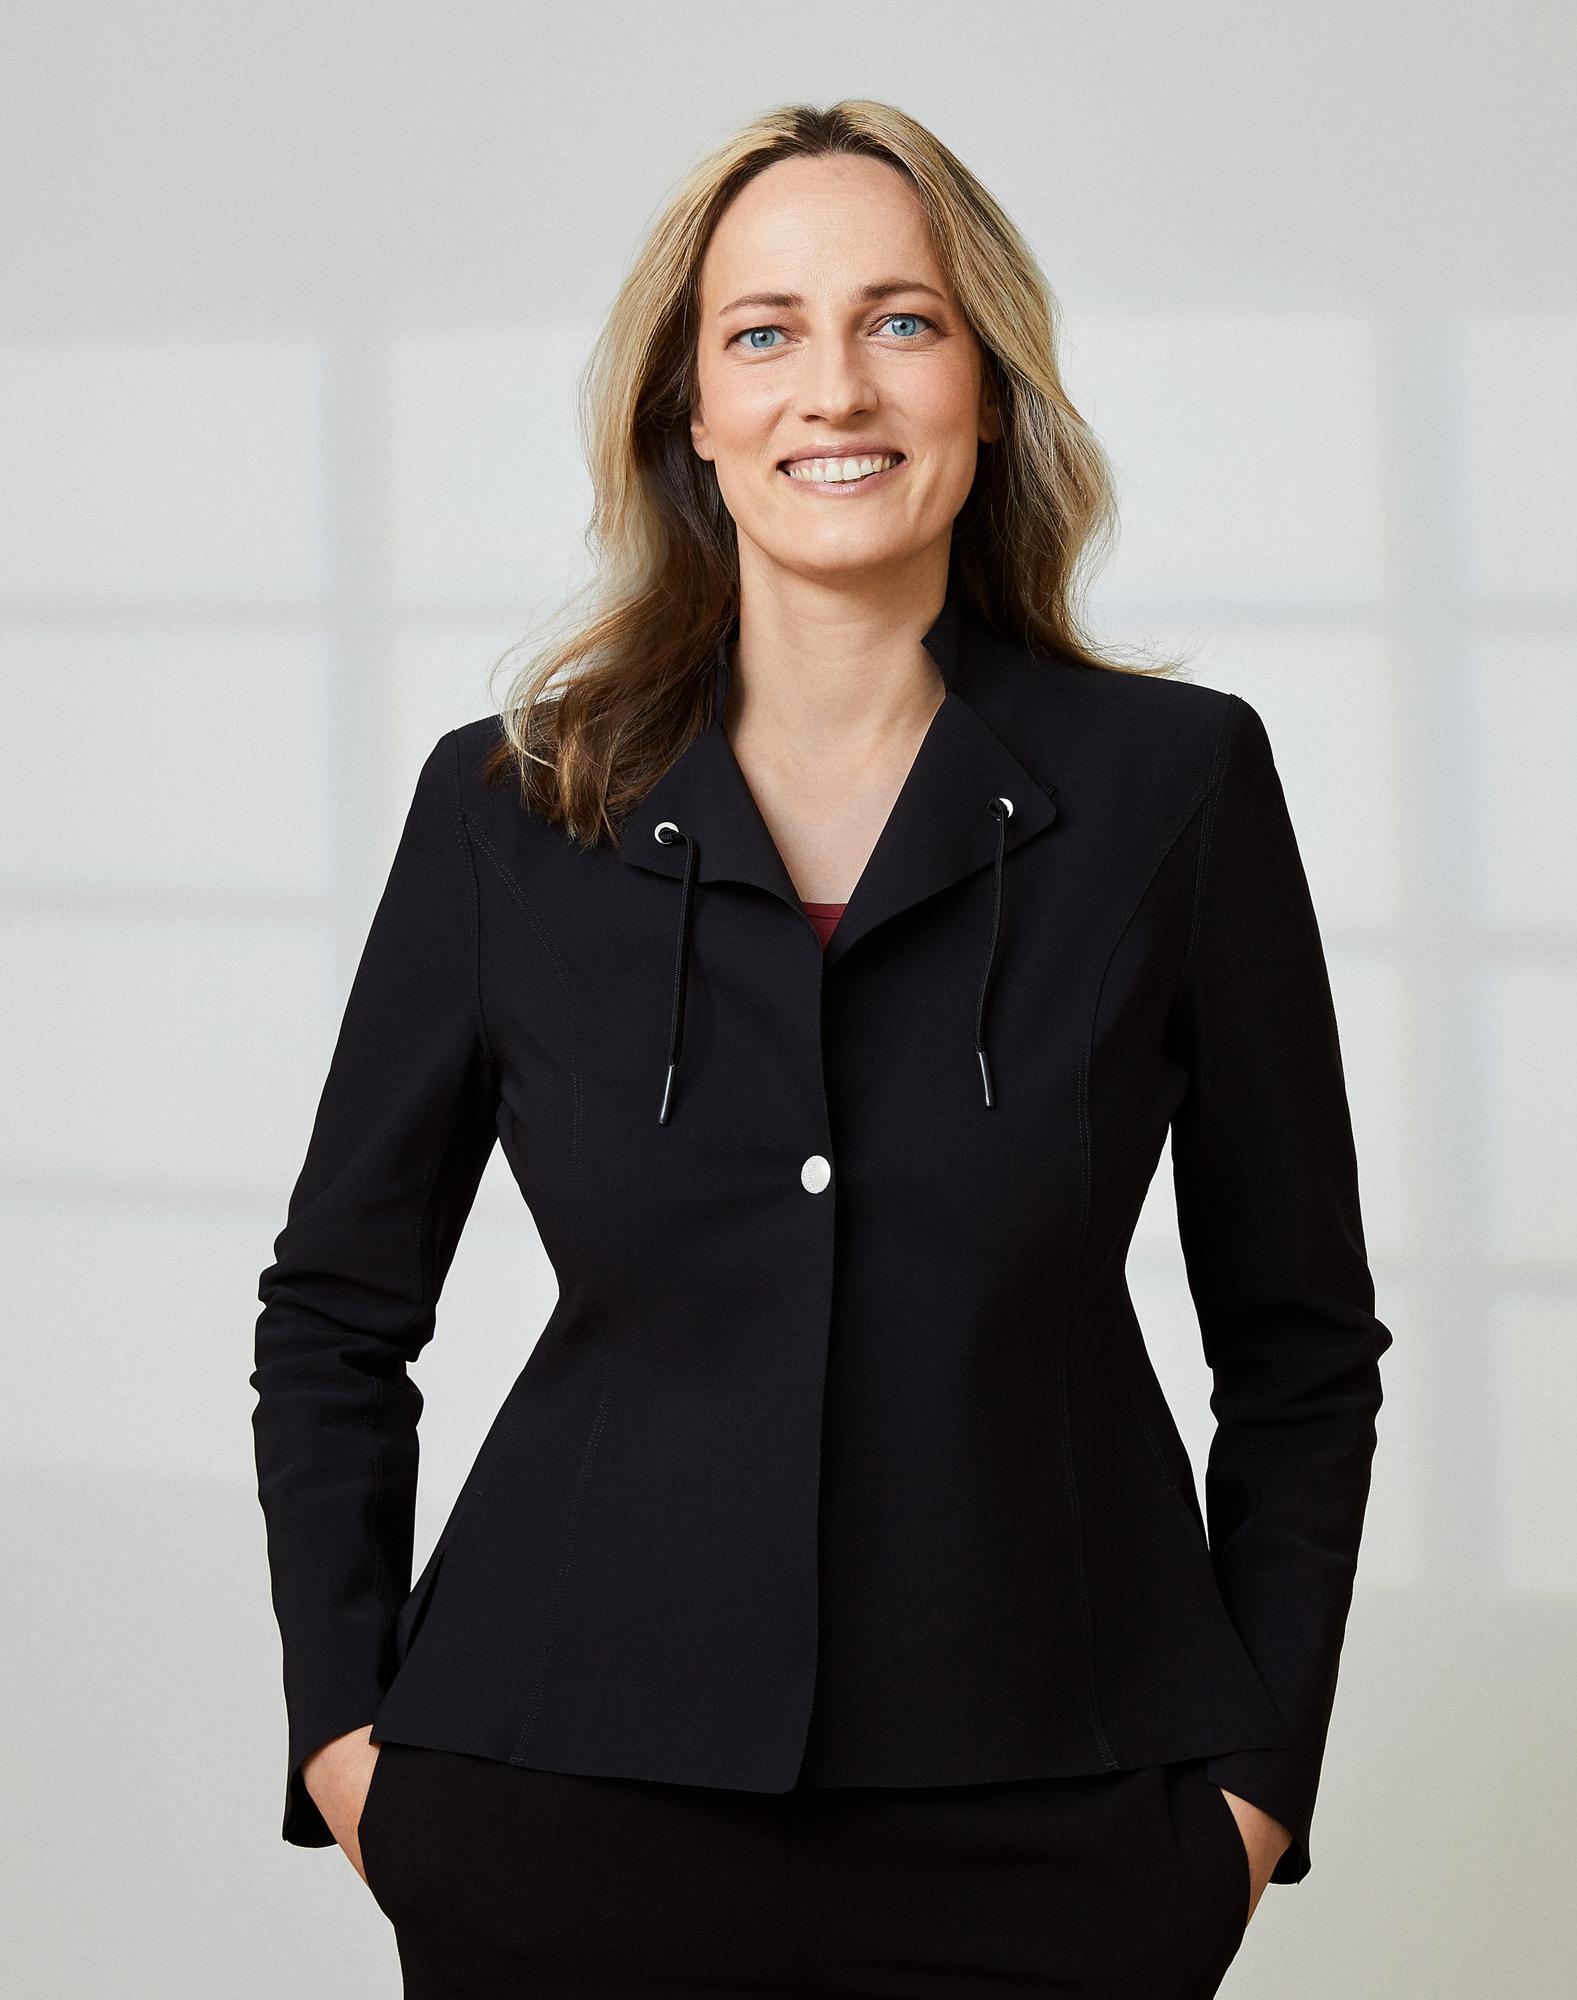 Jana Leimane